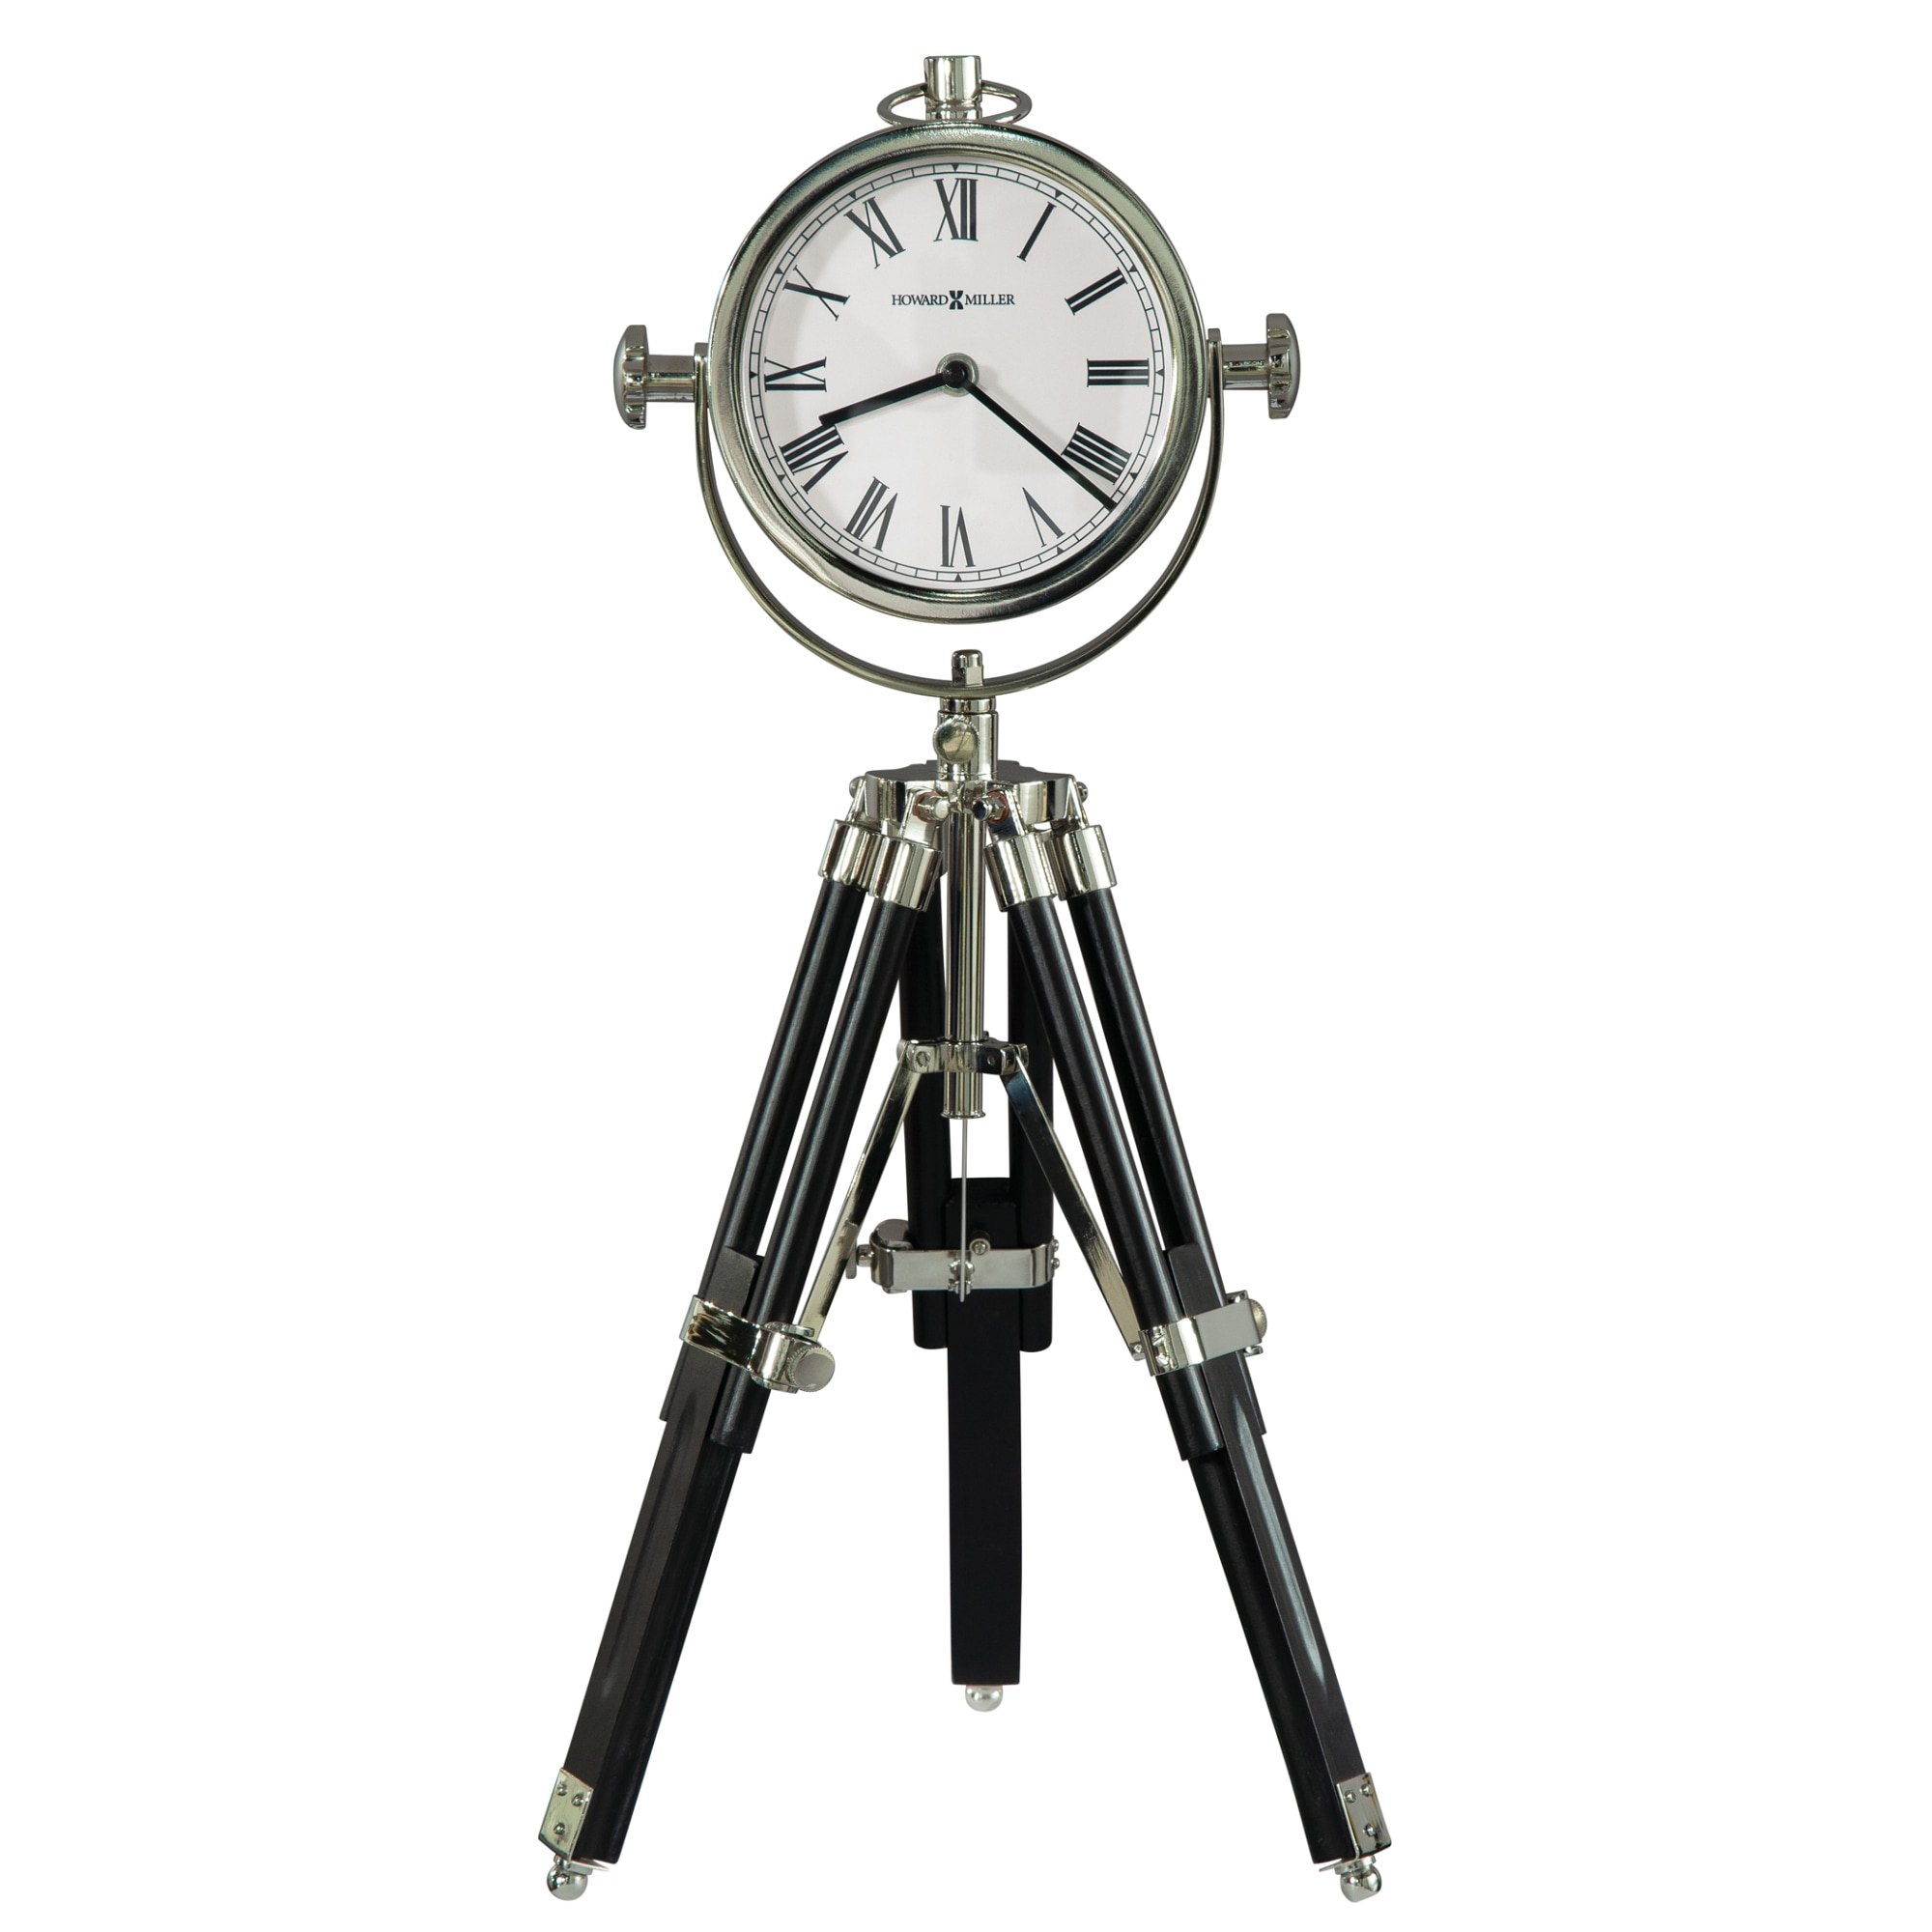 Image for Howard Miller Time Surveyor II Mantel Clock 635211 from Howard Miller Official Website